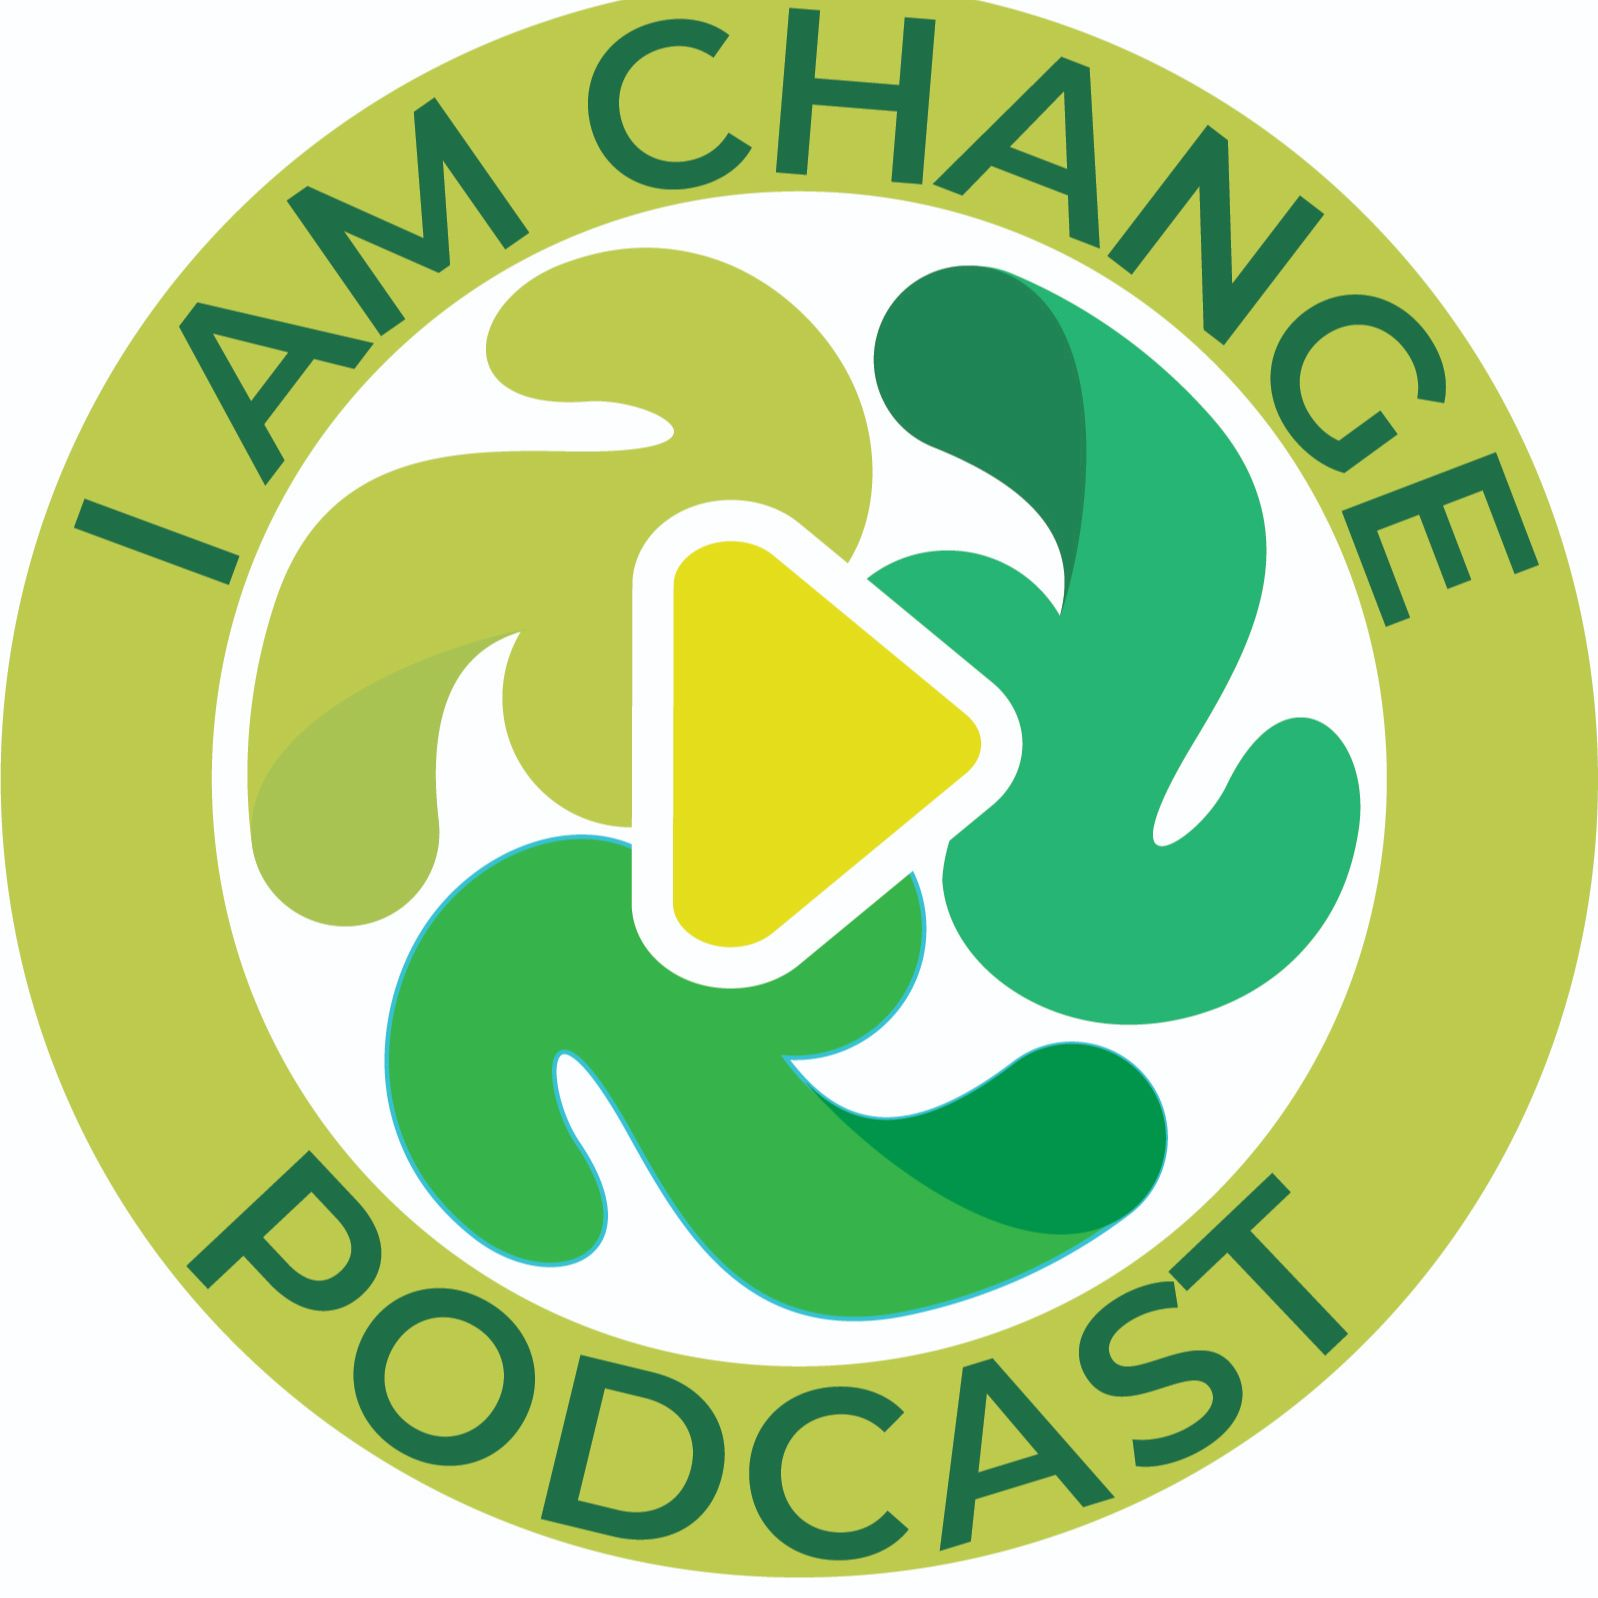 I Am Change podcast